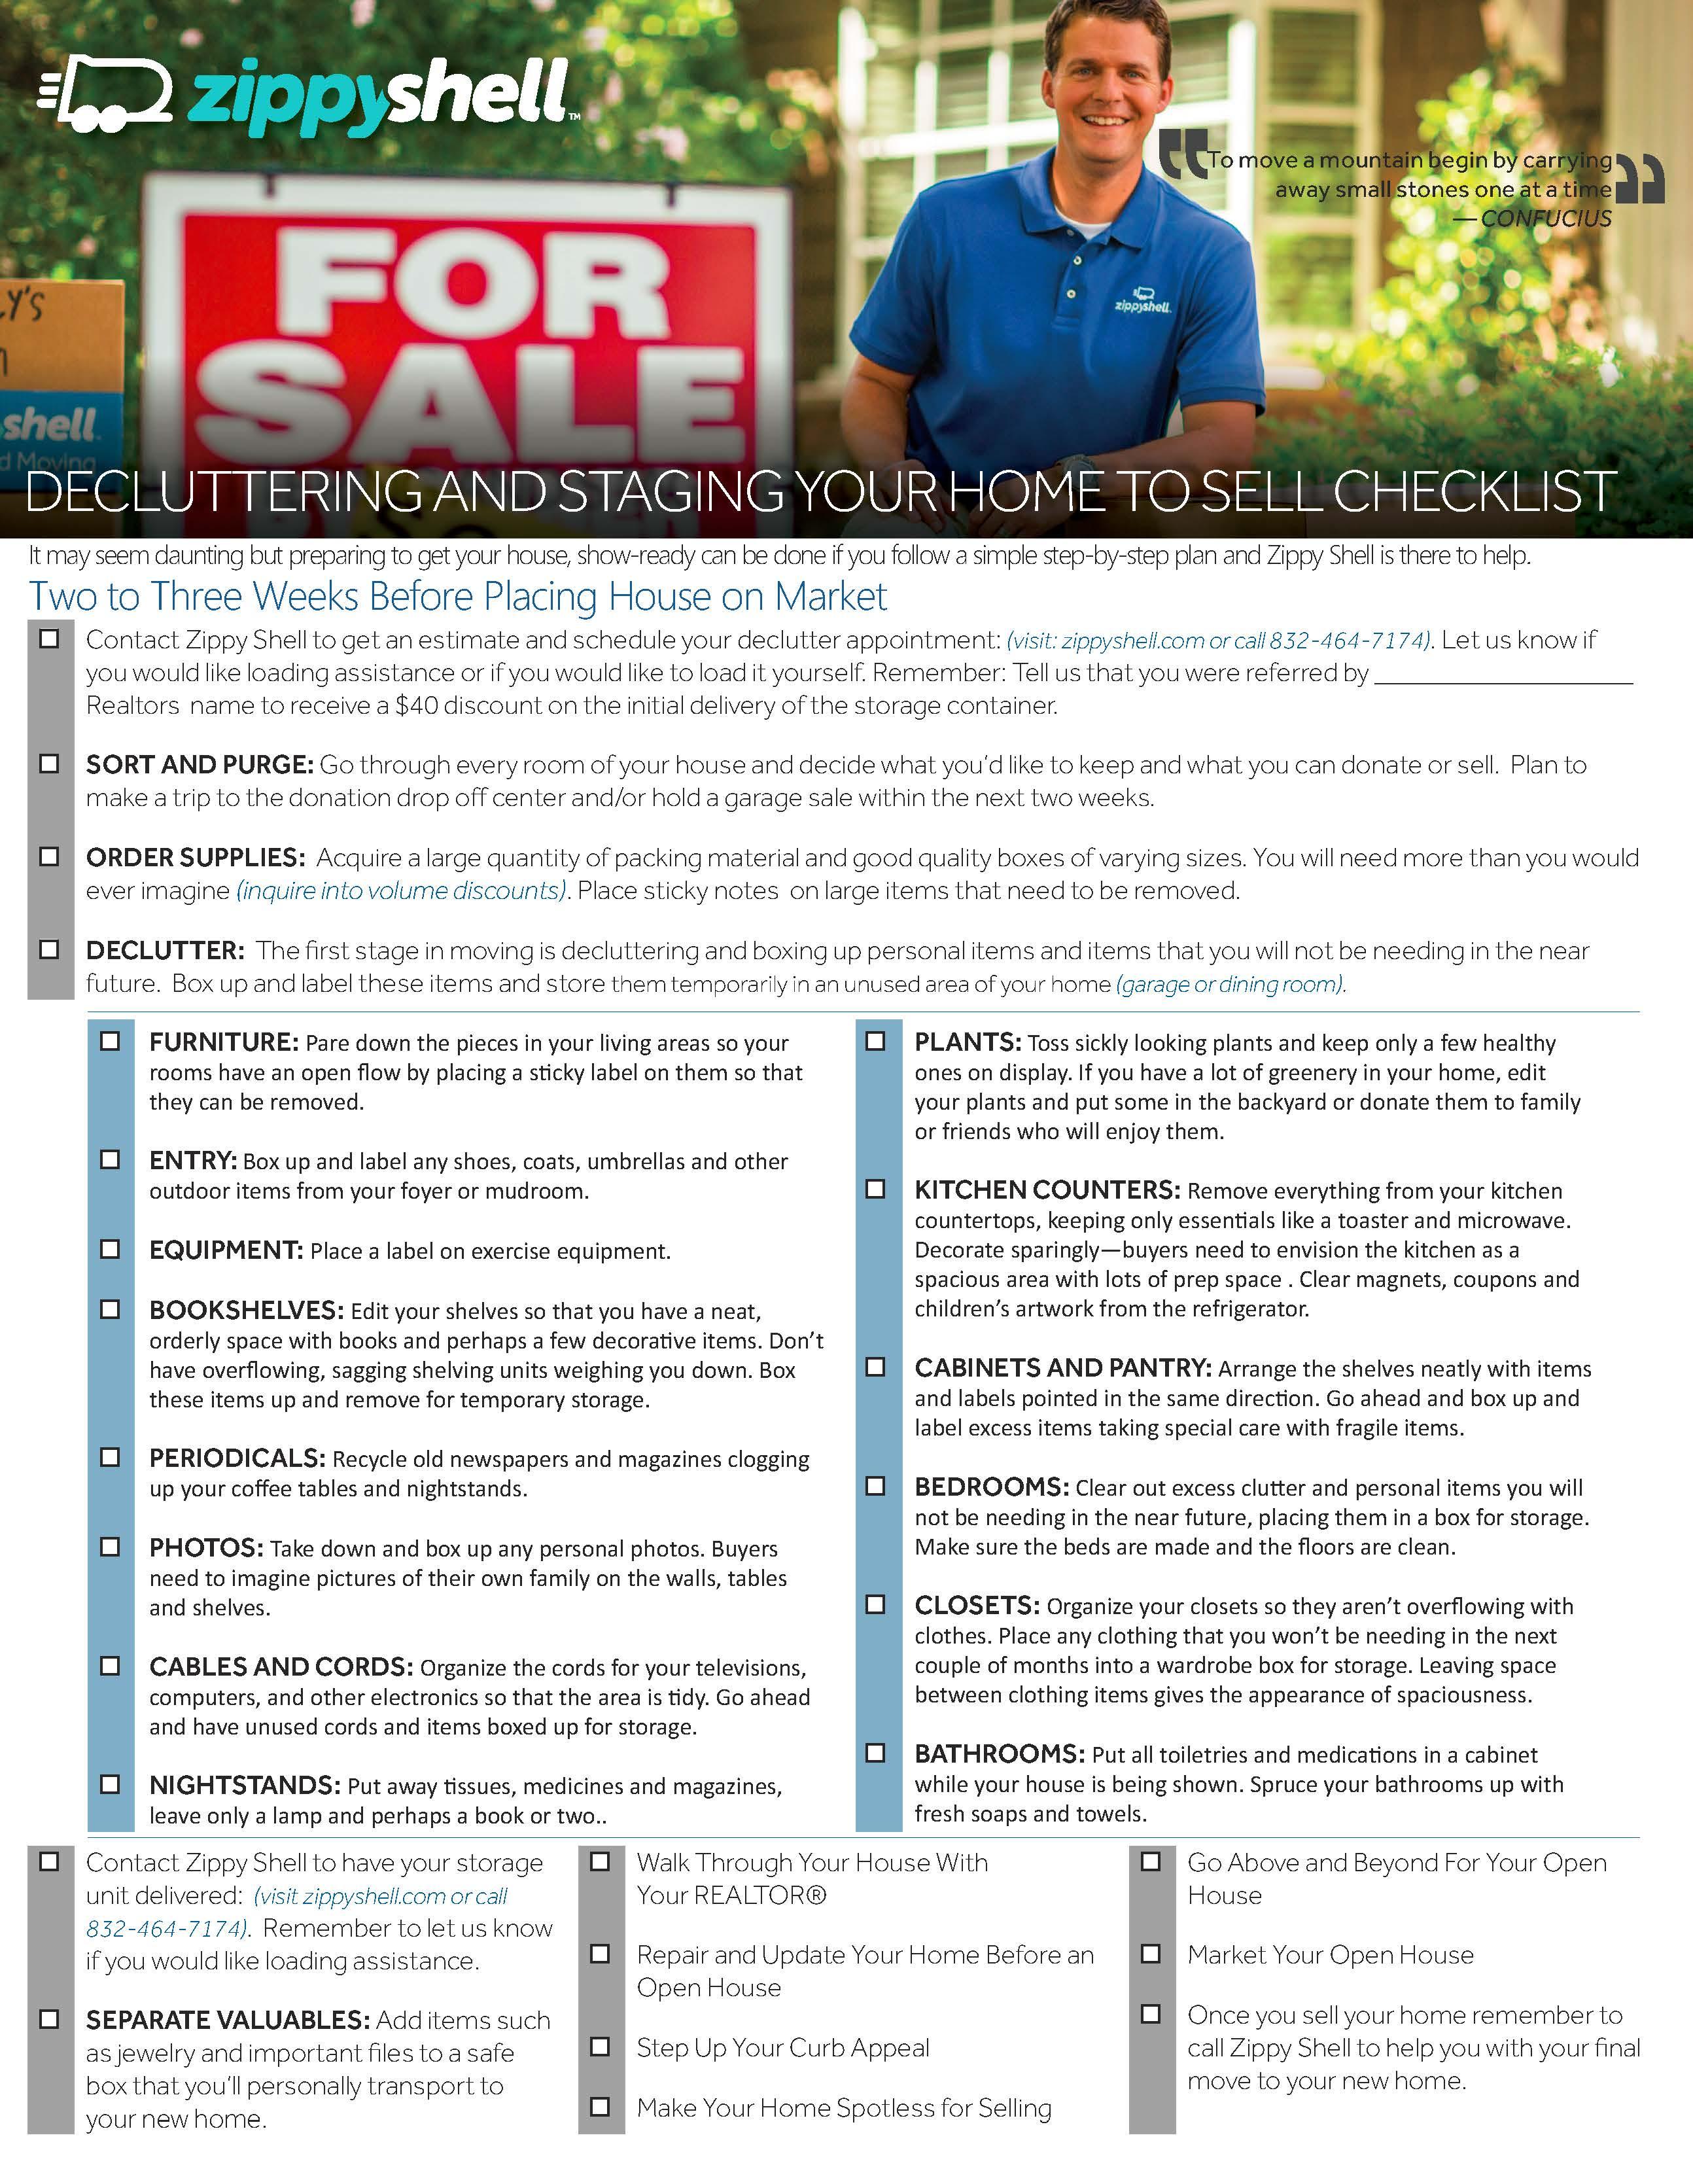 Zippy Shell Houston - Declutter Checklist